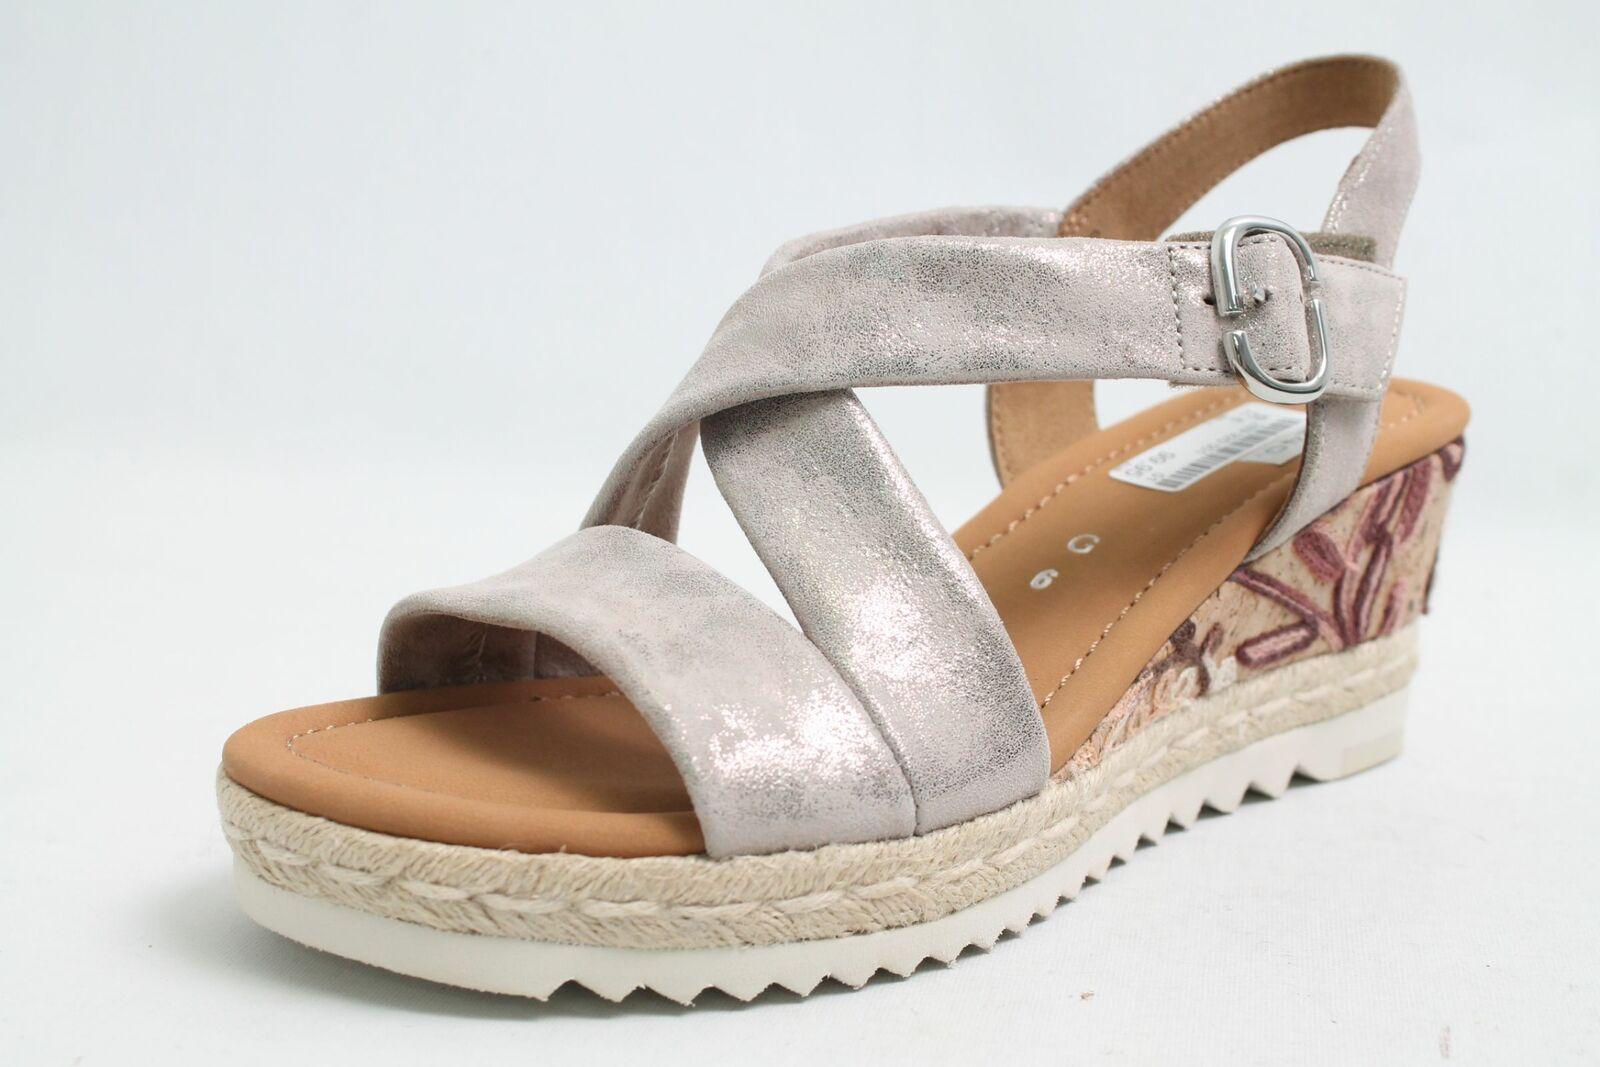 Gabor Sandalen grau Metall Effekt echt Leder Klettverschluss Schuhweite G Damen